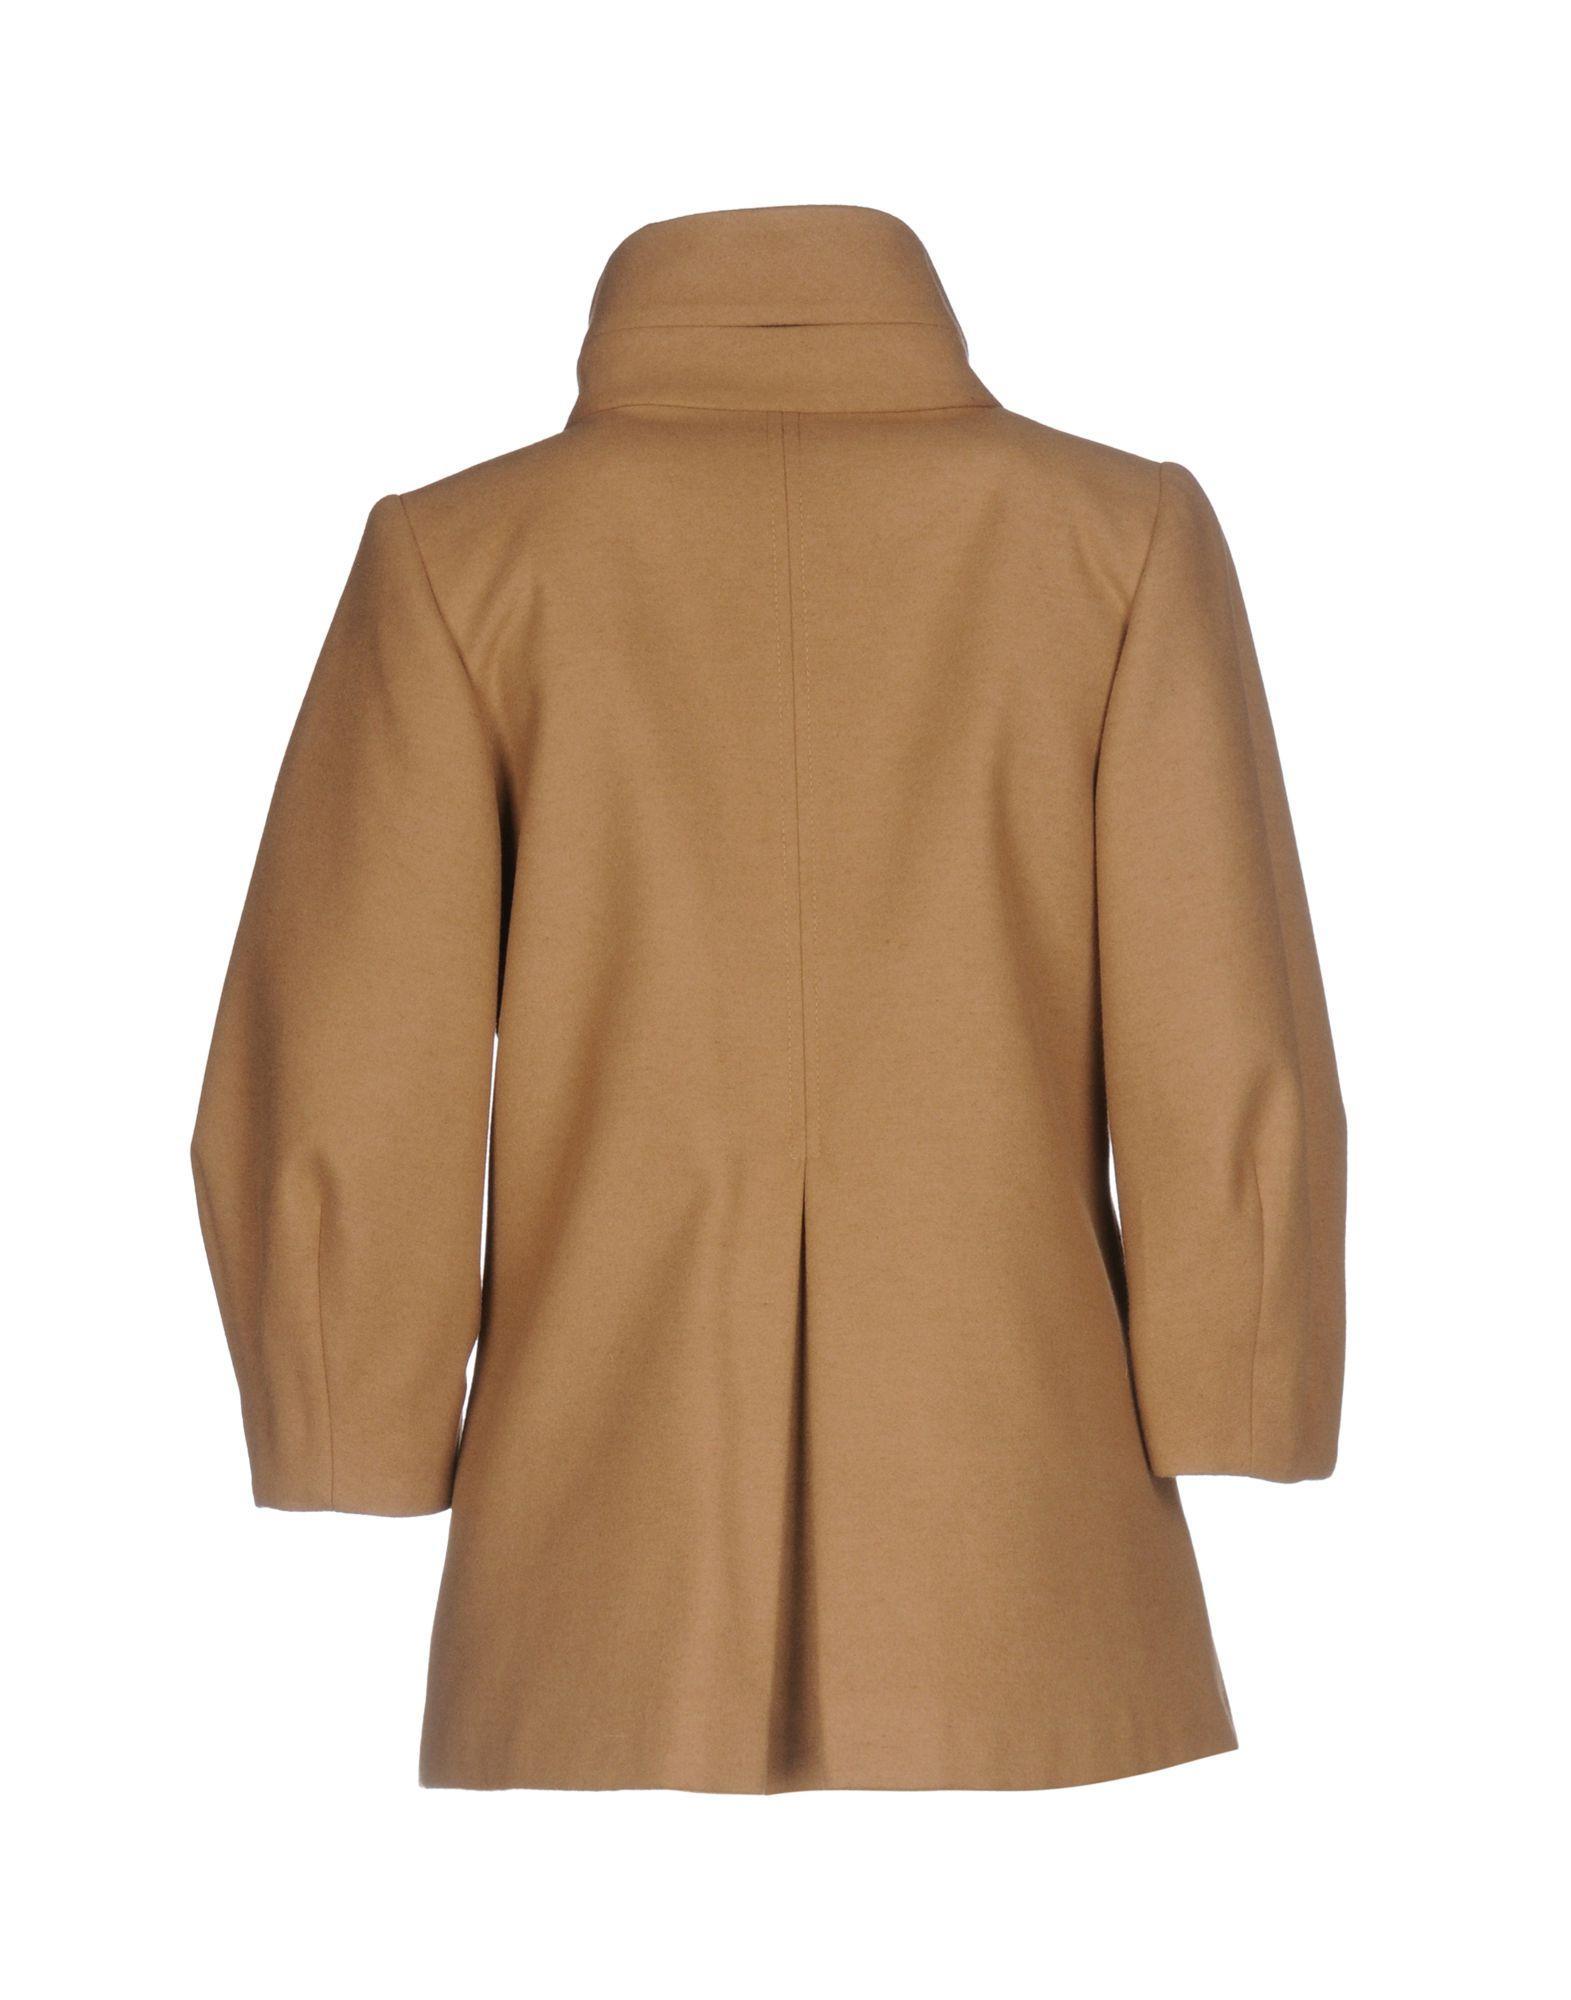 lyst boutique de la femme coat in brown. Black Bedroom Furniture Sets. Home Design Ideas